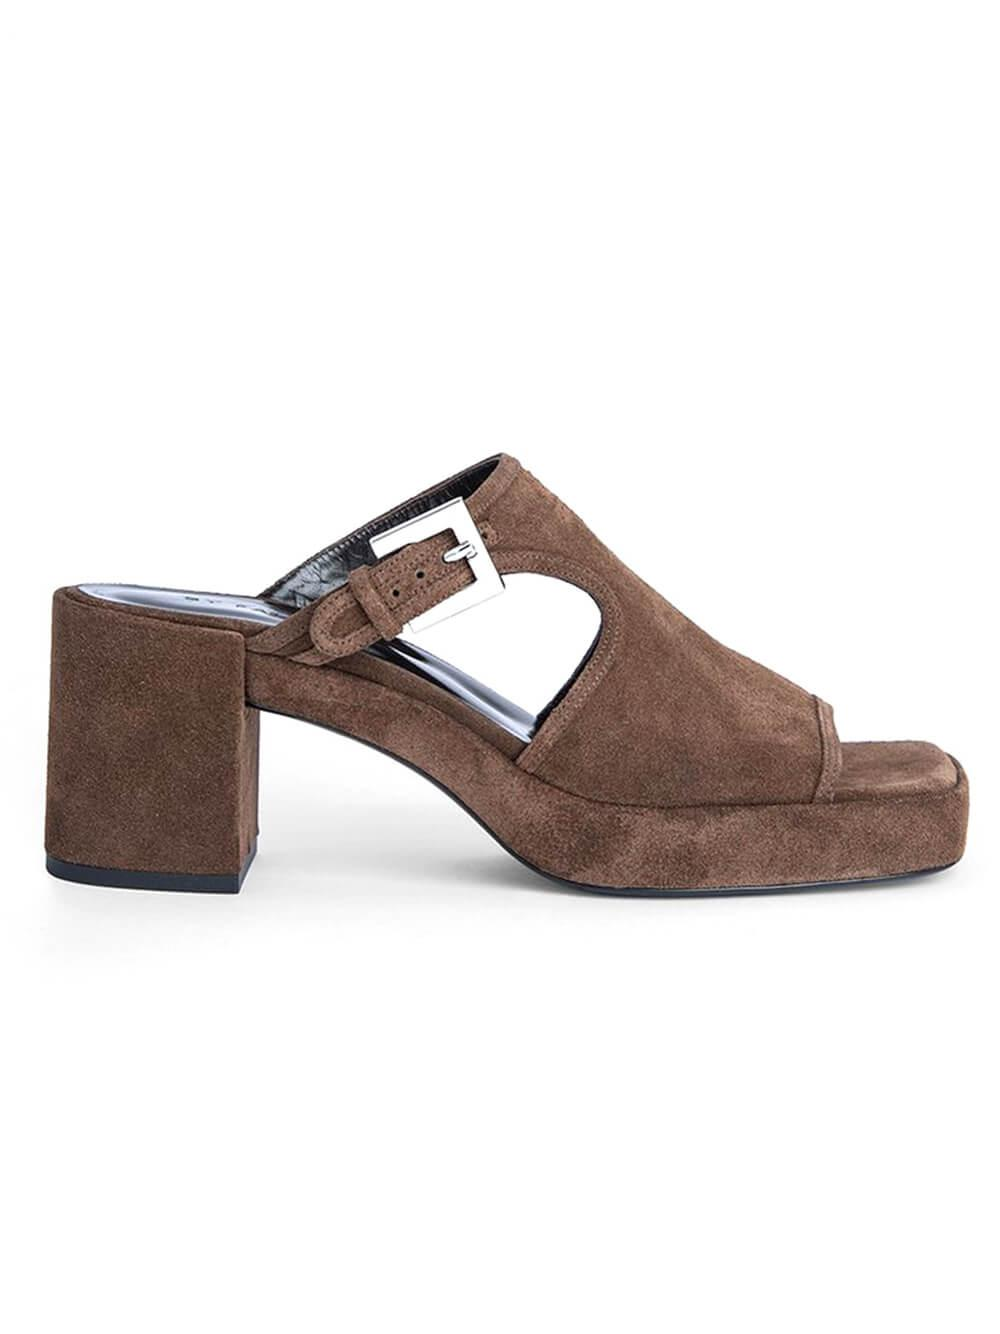 Melba Block Heel Sandal Item # 21PFMELBMWOU